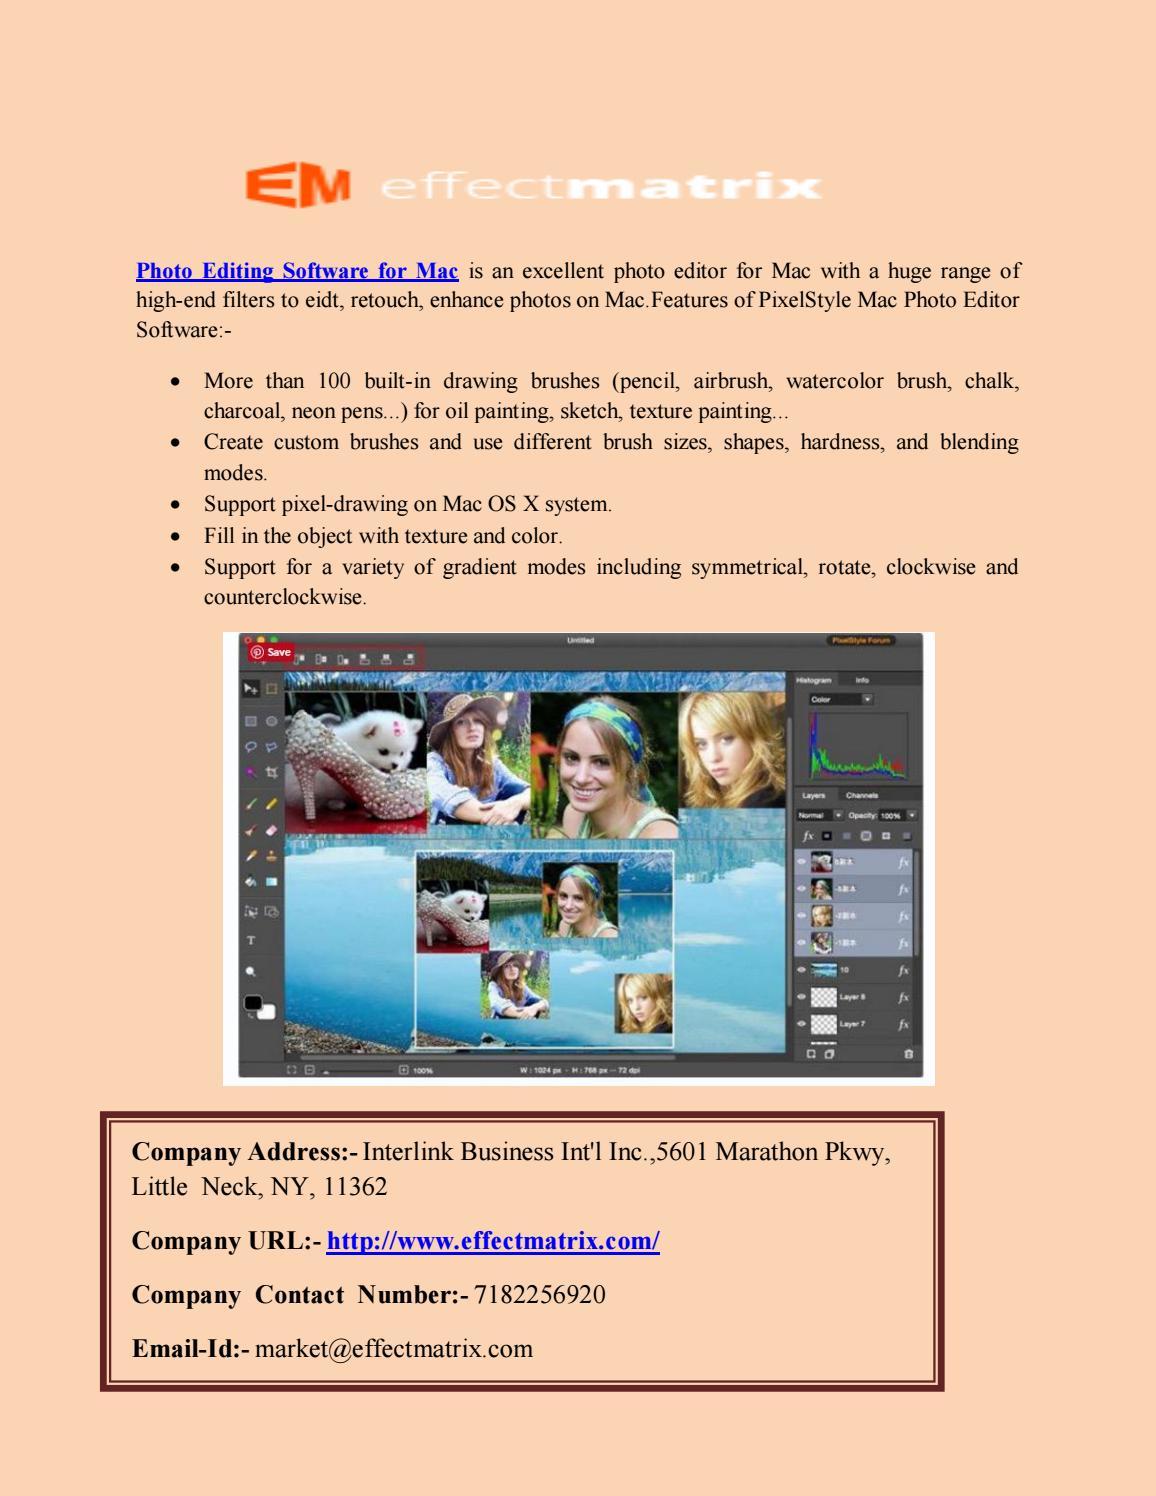 MAC Photo Editor – Photo Editing Software for Mac by leey kate - issuu